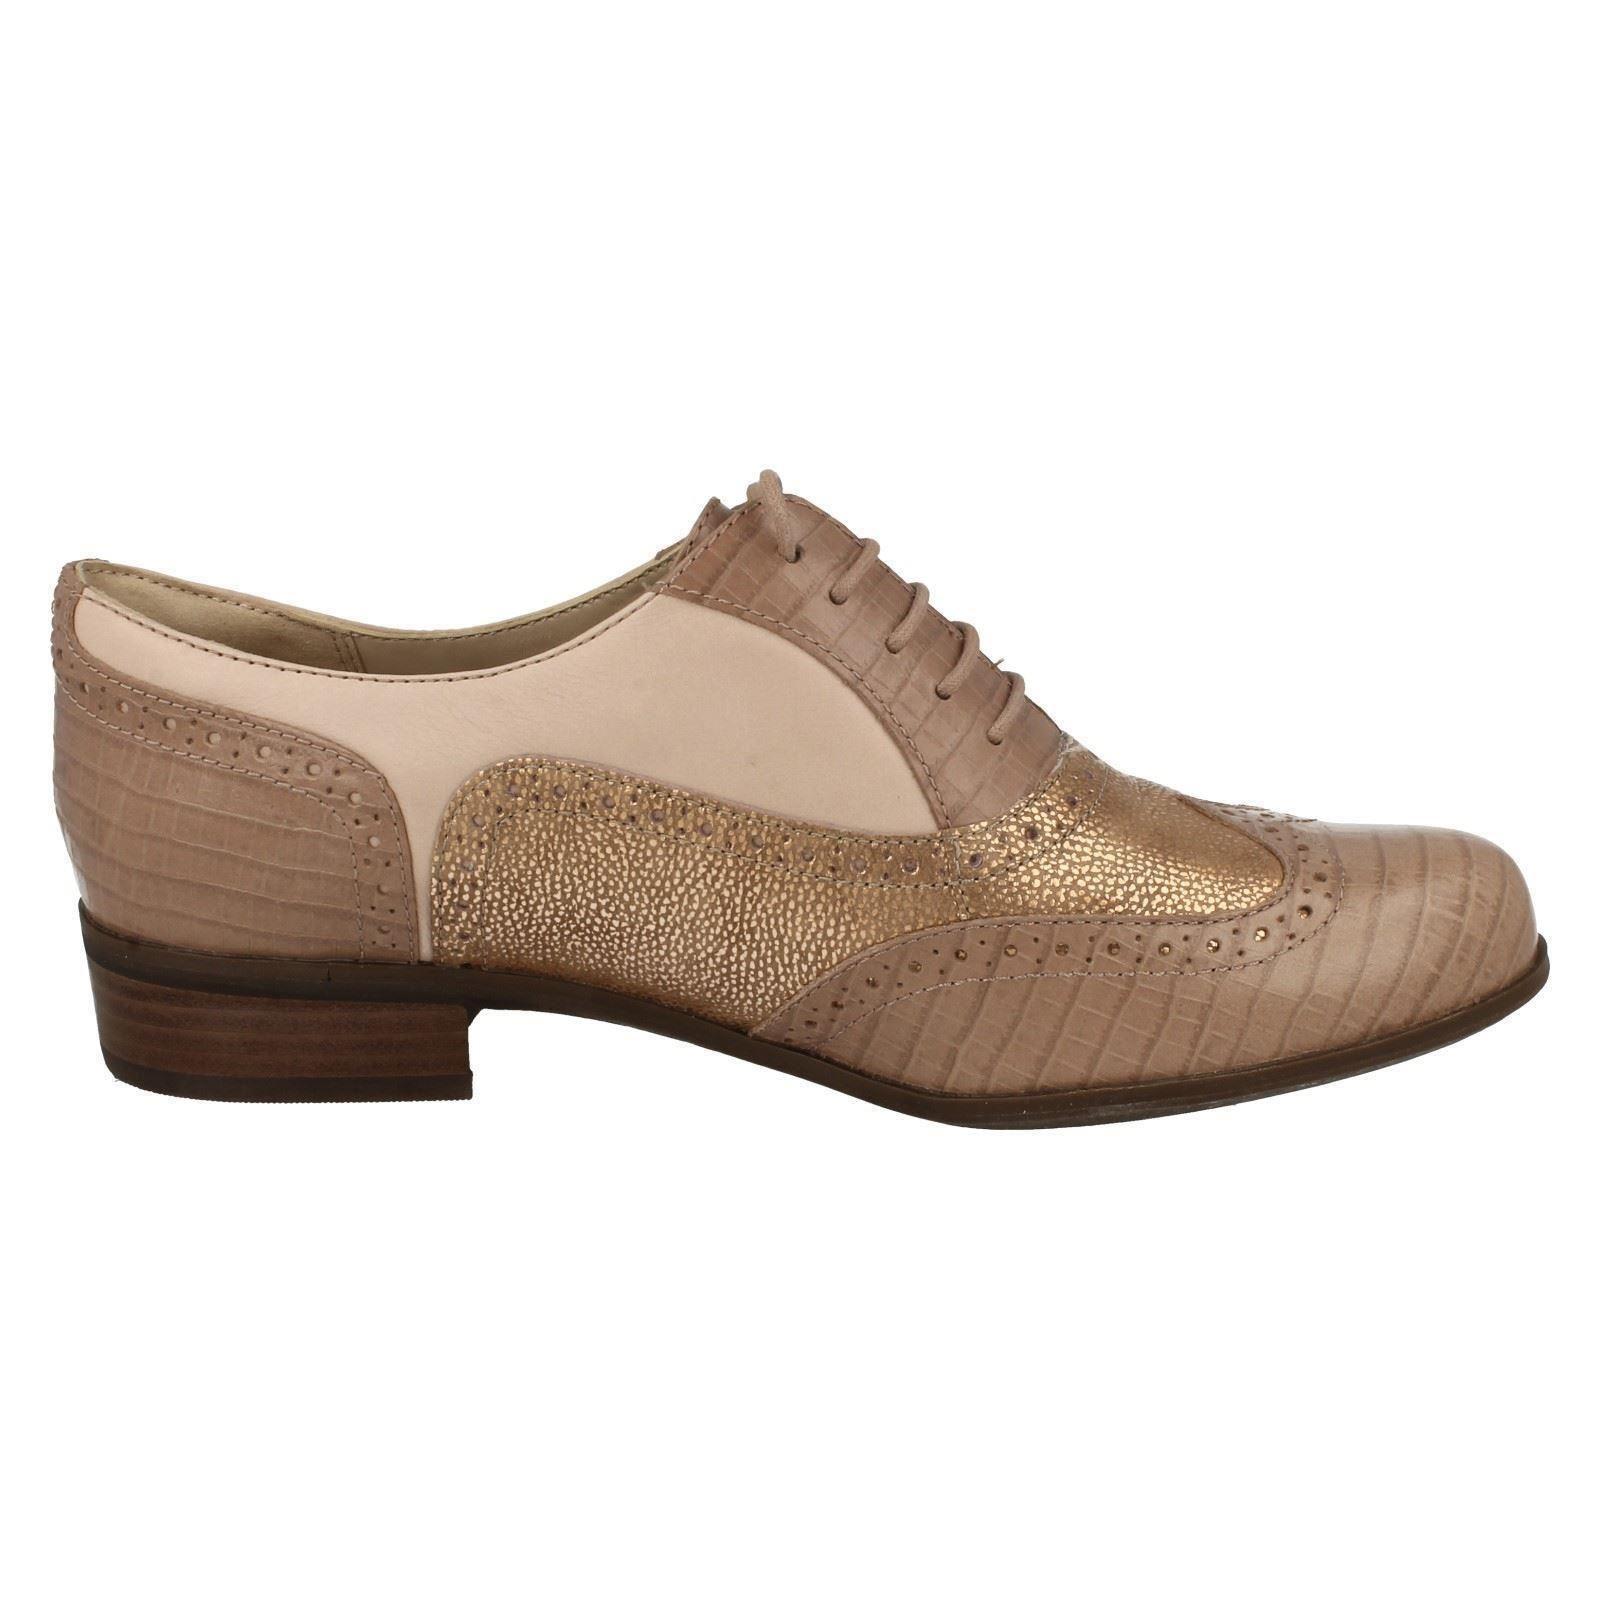 clarks ladies vintage style brogue shoes hamble oak ebay. Black Bedroom Furniture Sets. Home Design Ideas